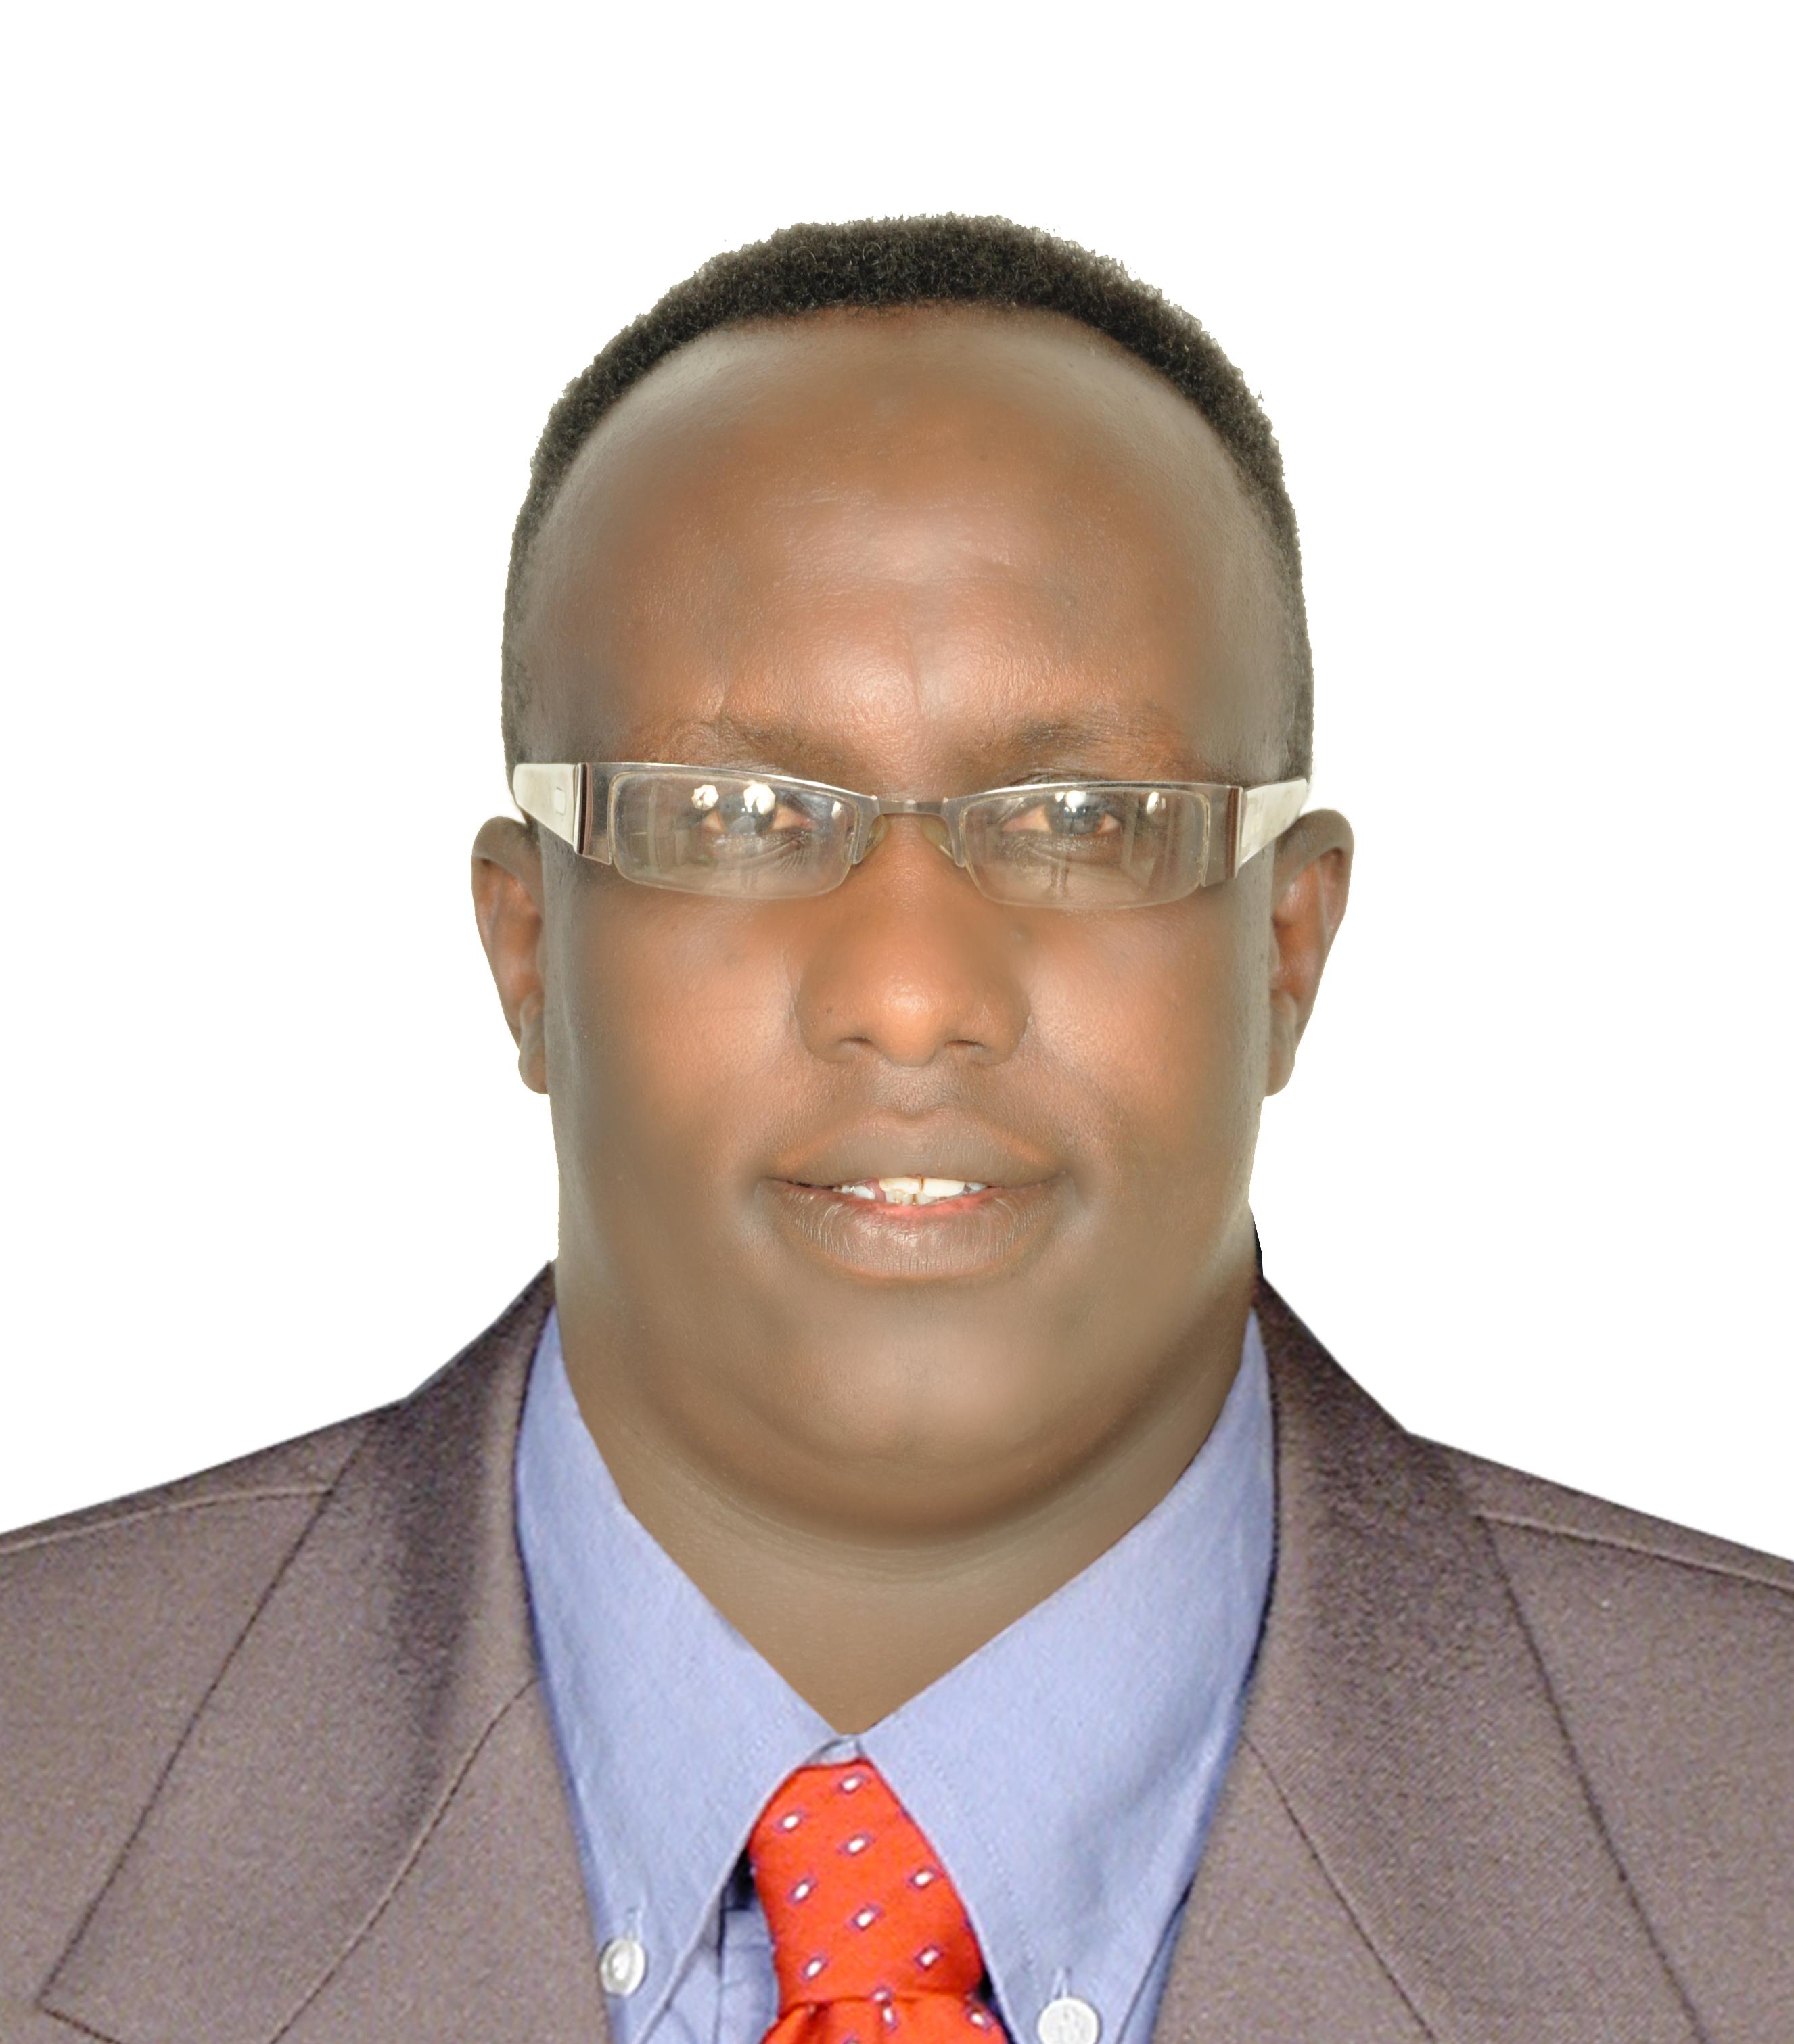 Mohammed Dahir Ahmed Updated Protriat